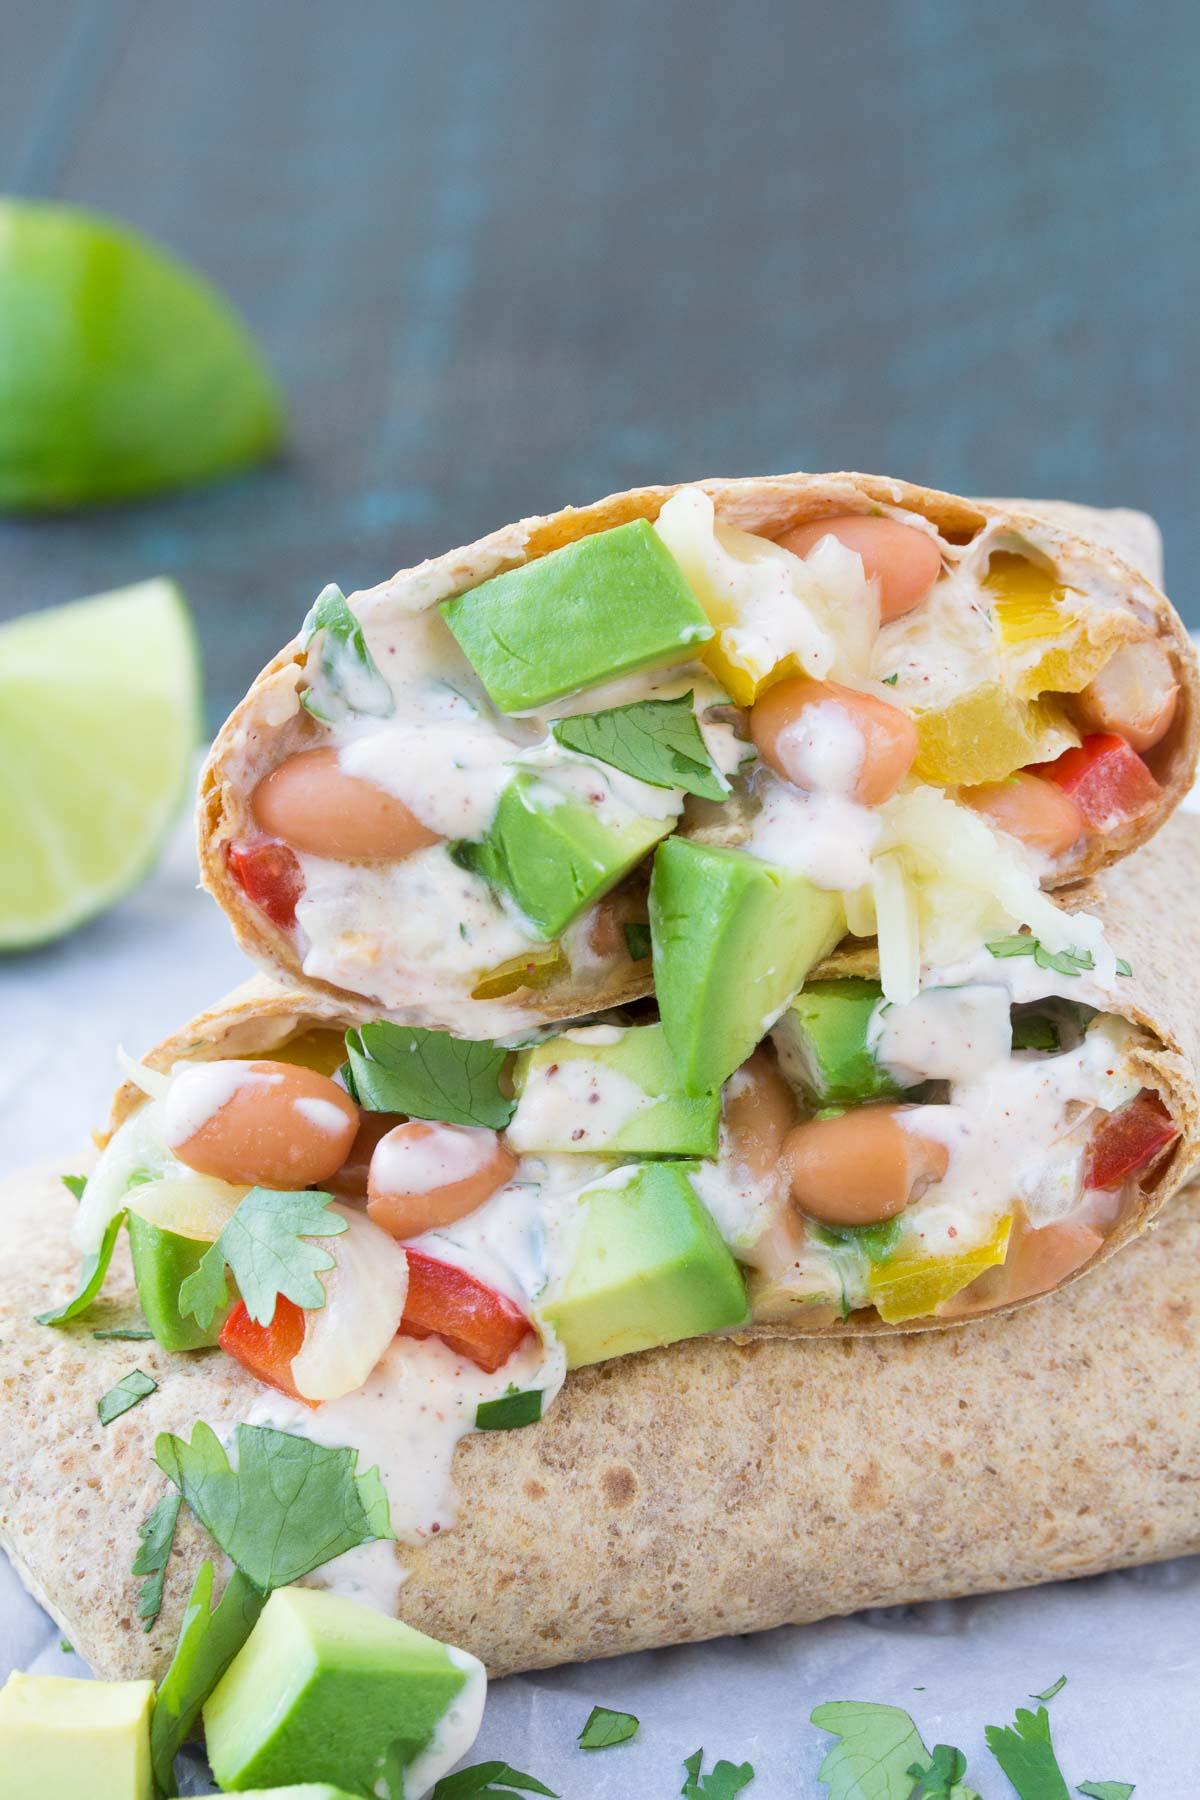 avocado vegetarian burrito with creamy sauce